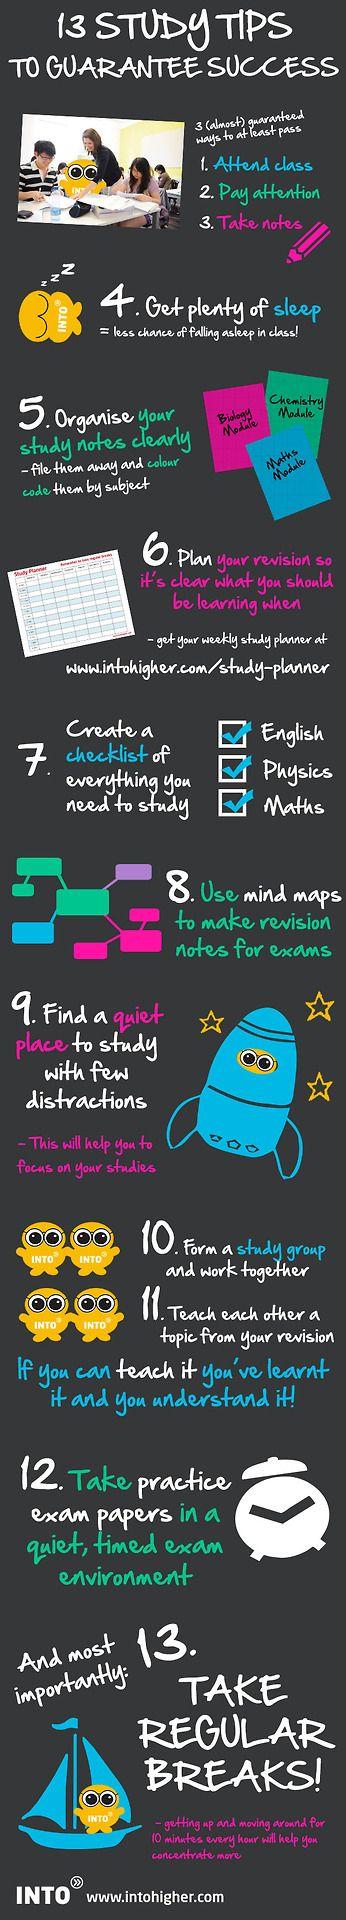 Study Tip How To Stay Focused Skill School Organization Dissertation Wmu